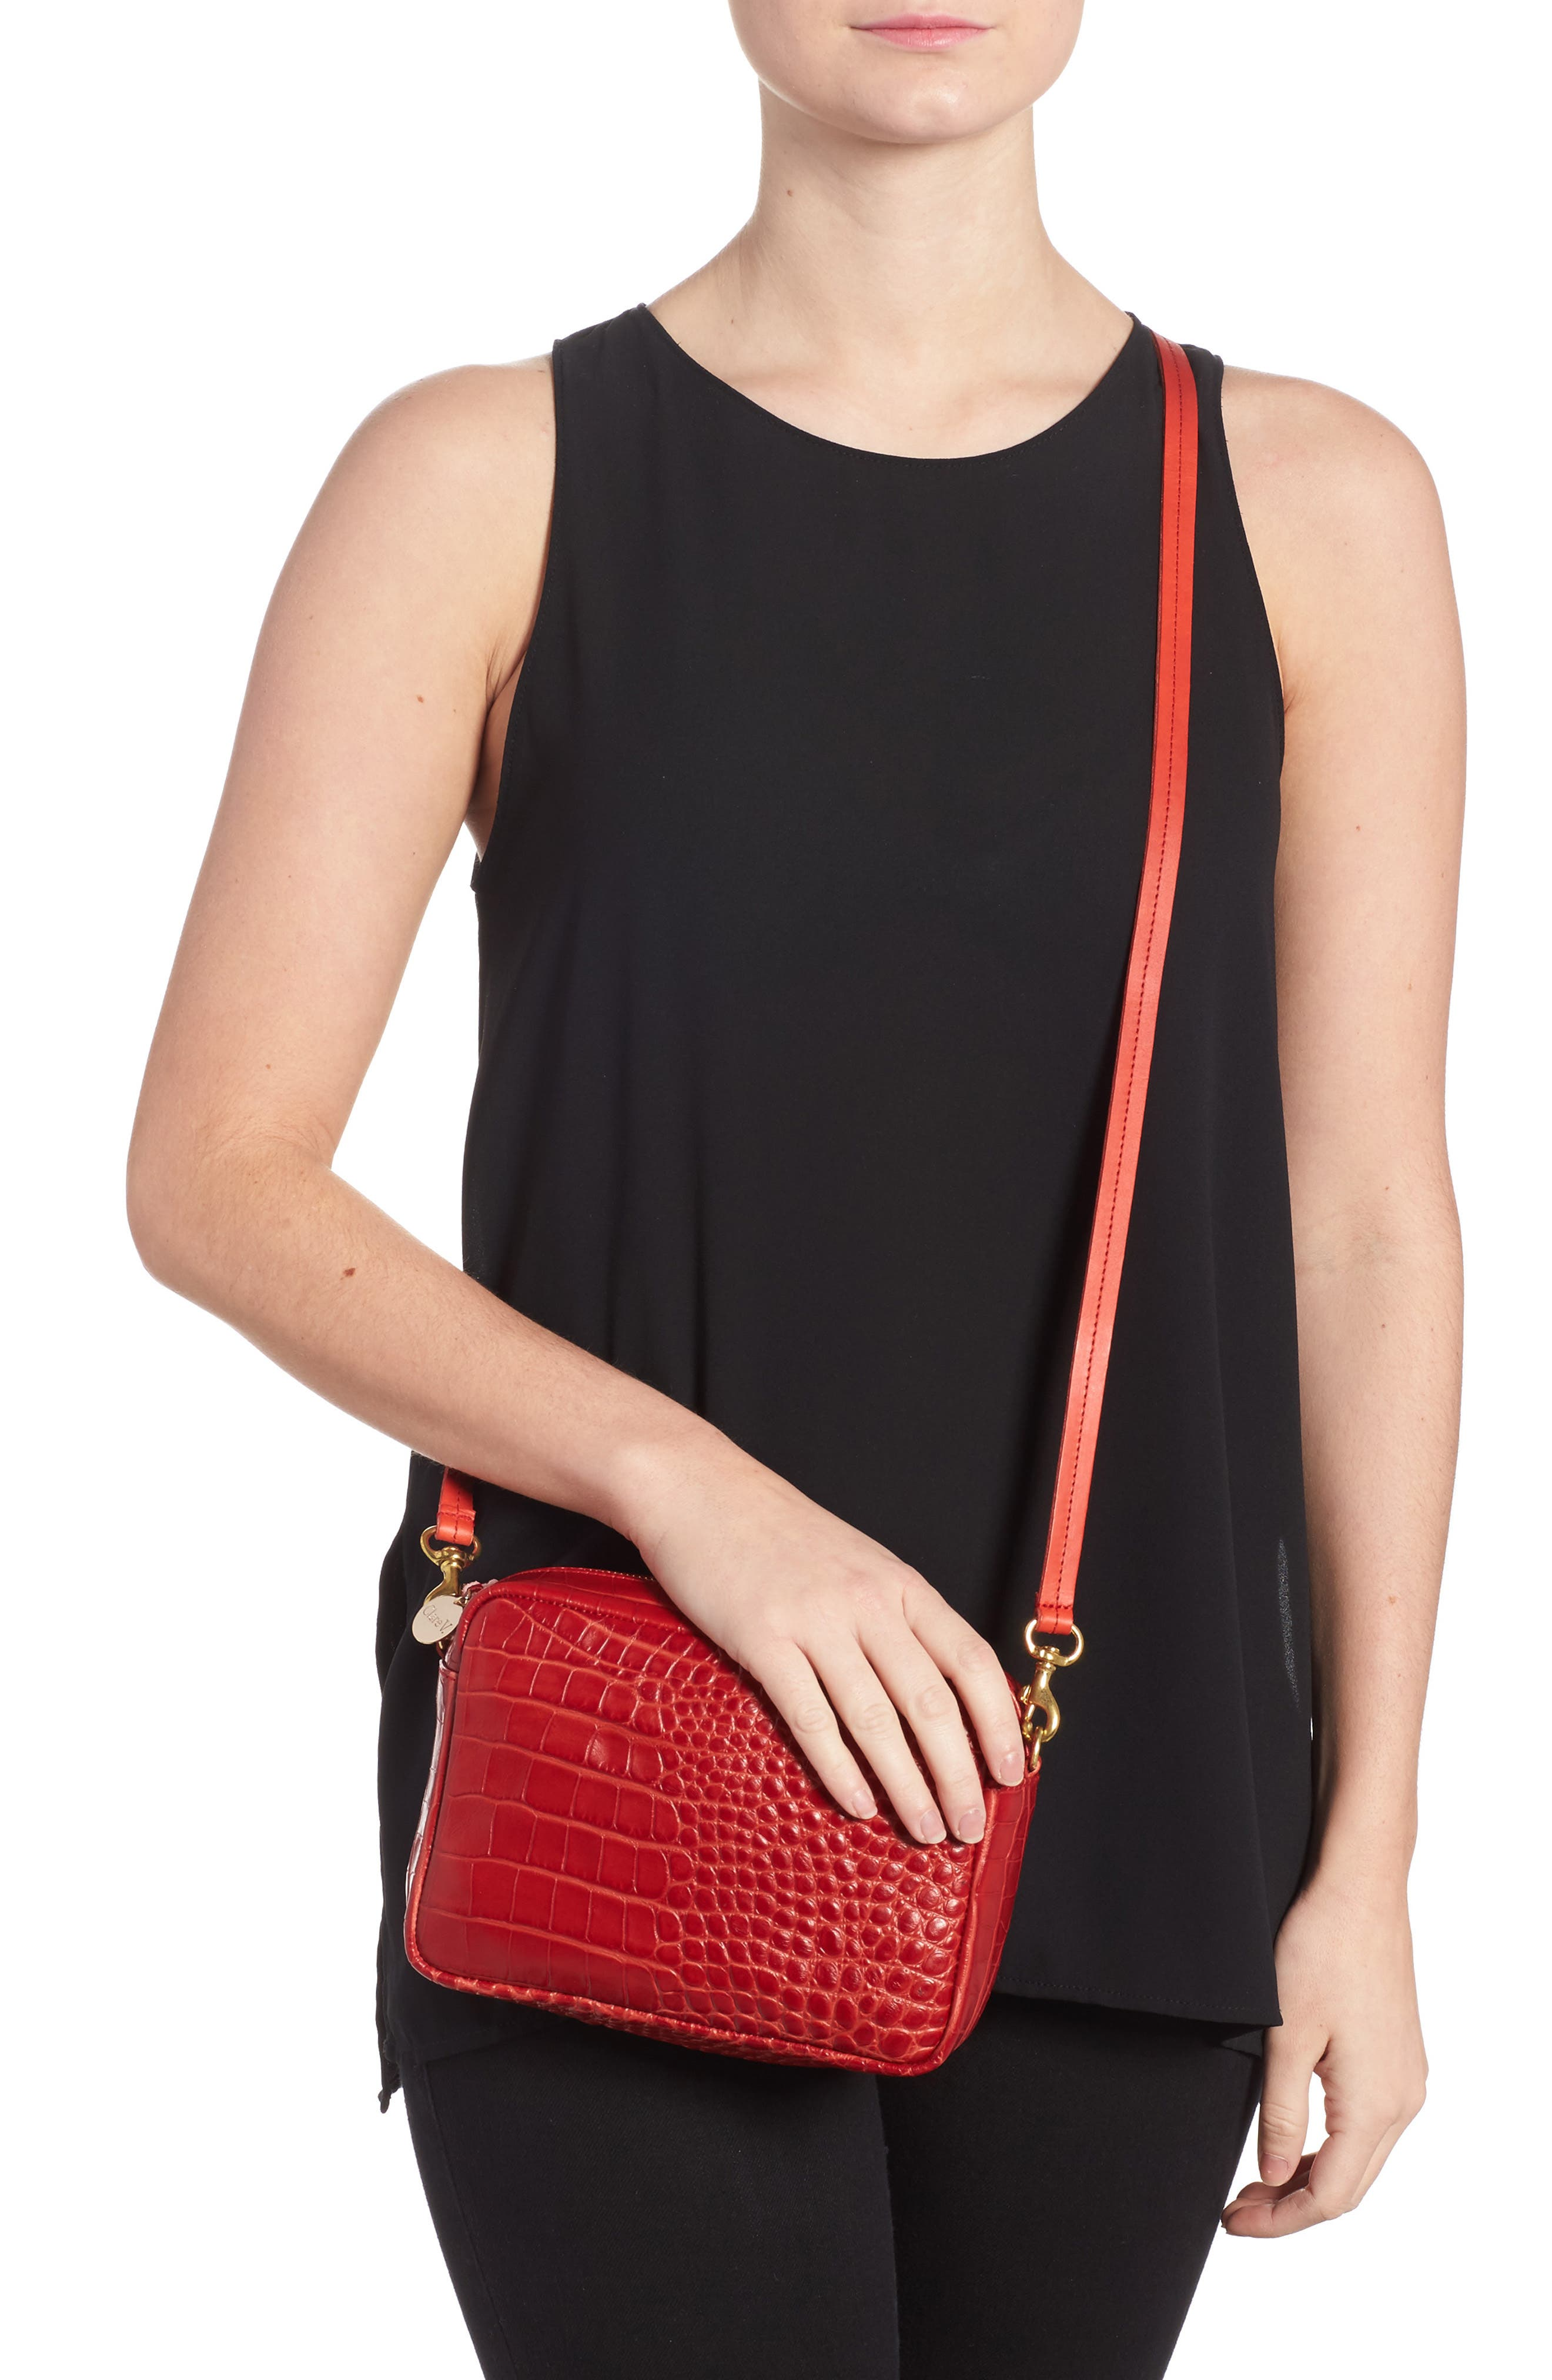 Midi Sac Supreme Croc Embossed Leather Crossbody Bag,                             Alternate thumbnail 2, color,                             Red Croco